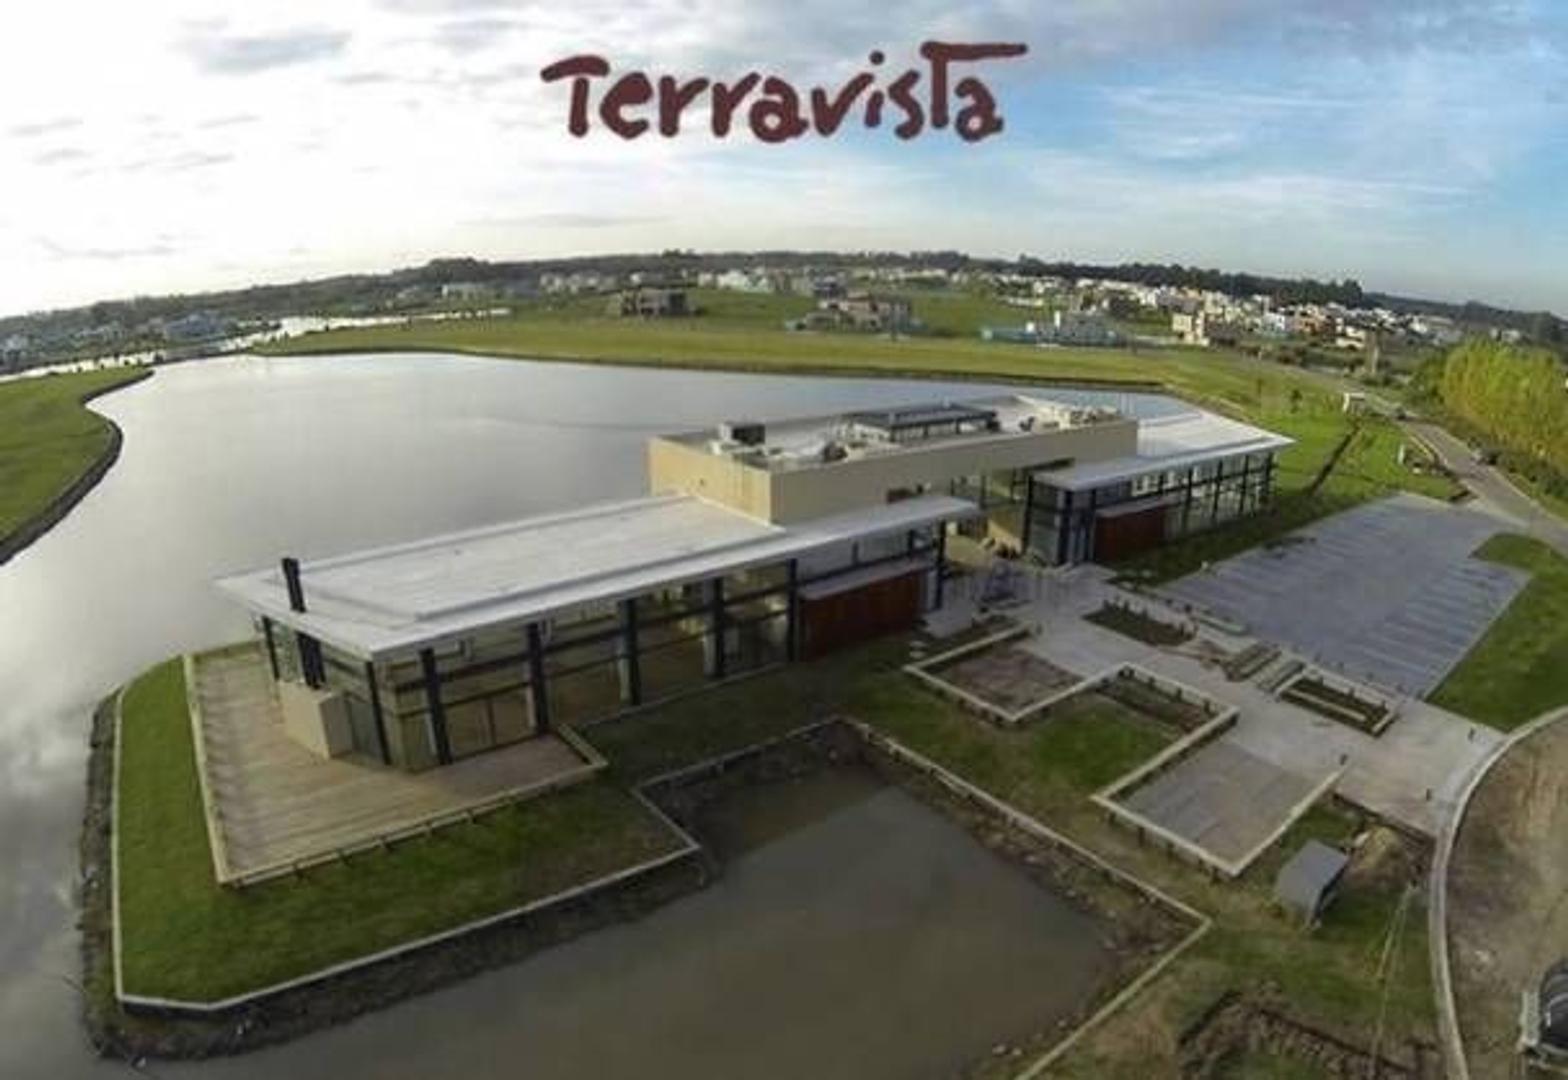 Terreno Lote en Venta Terravista, Zona Oeste - OES0932_LP122179_1